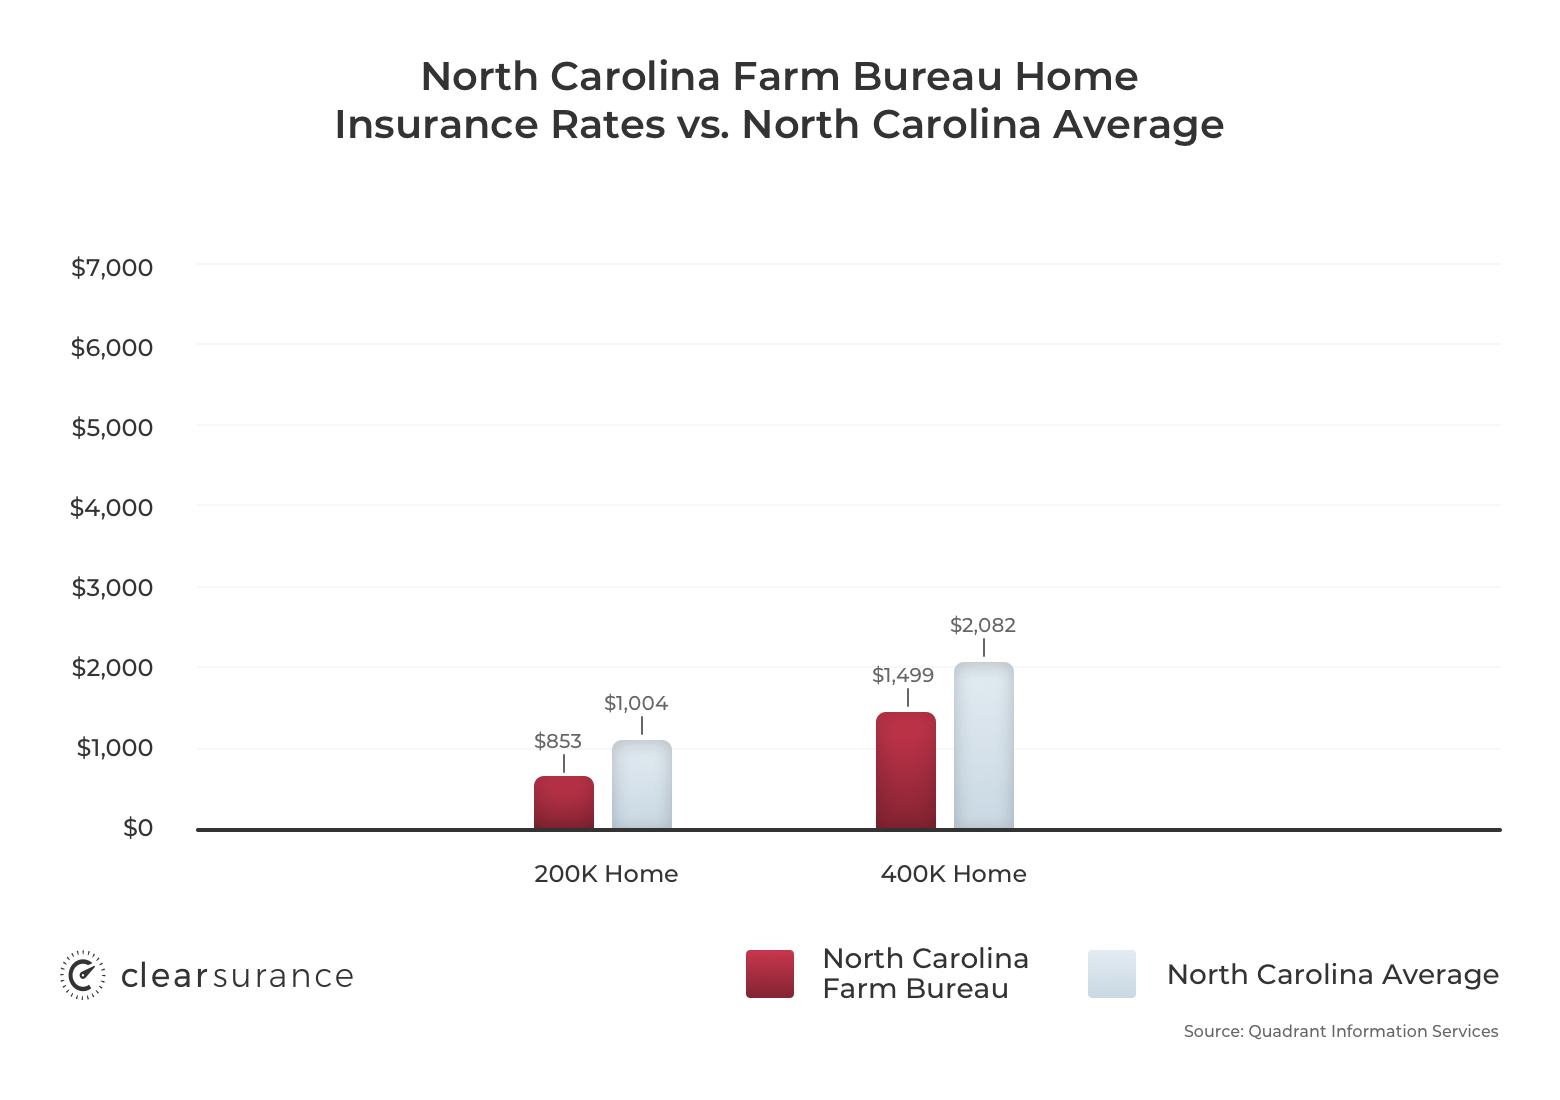 NC Farm Bureau homeowners insurance rates